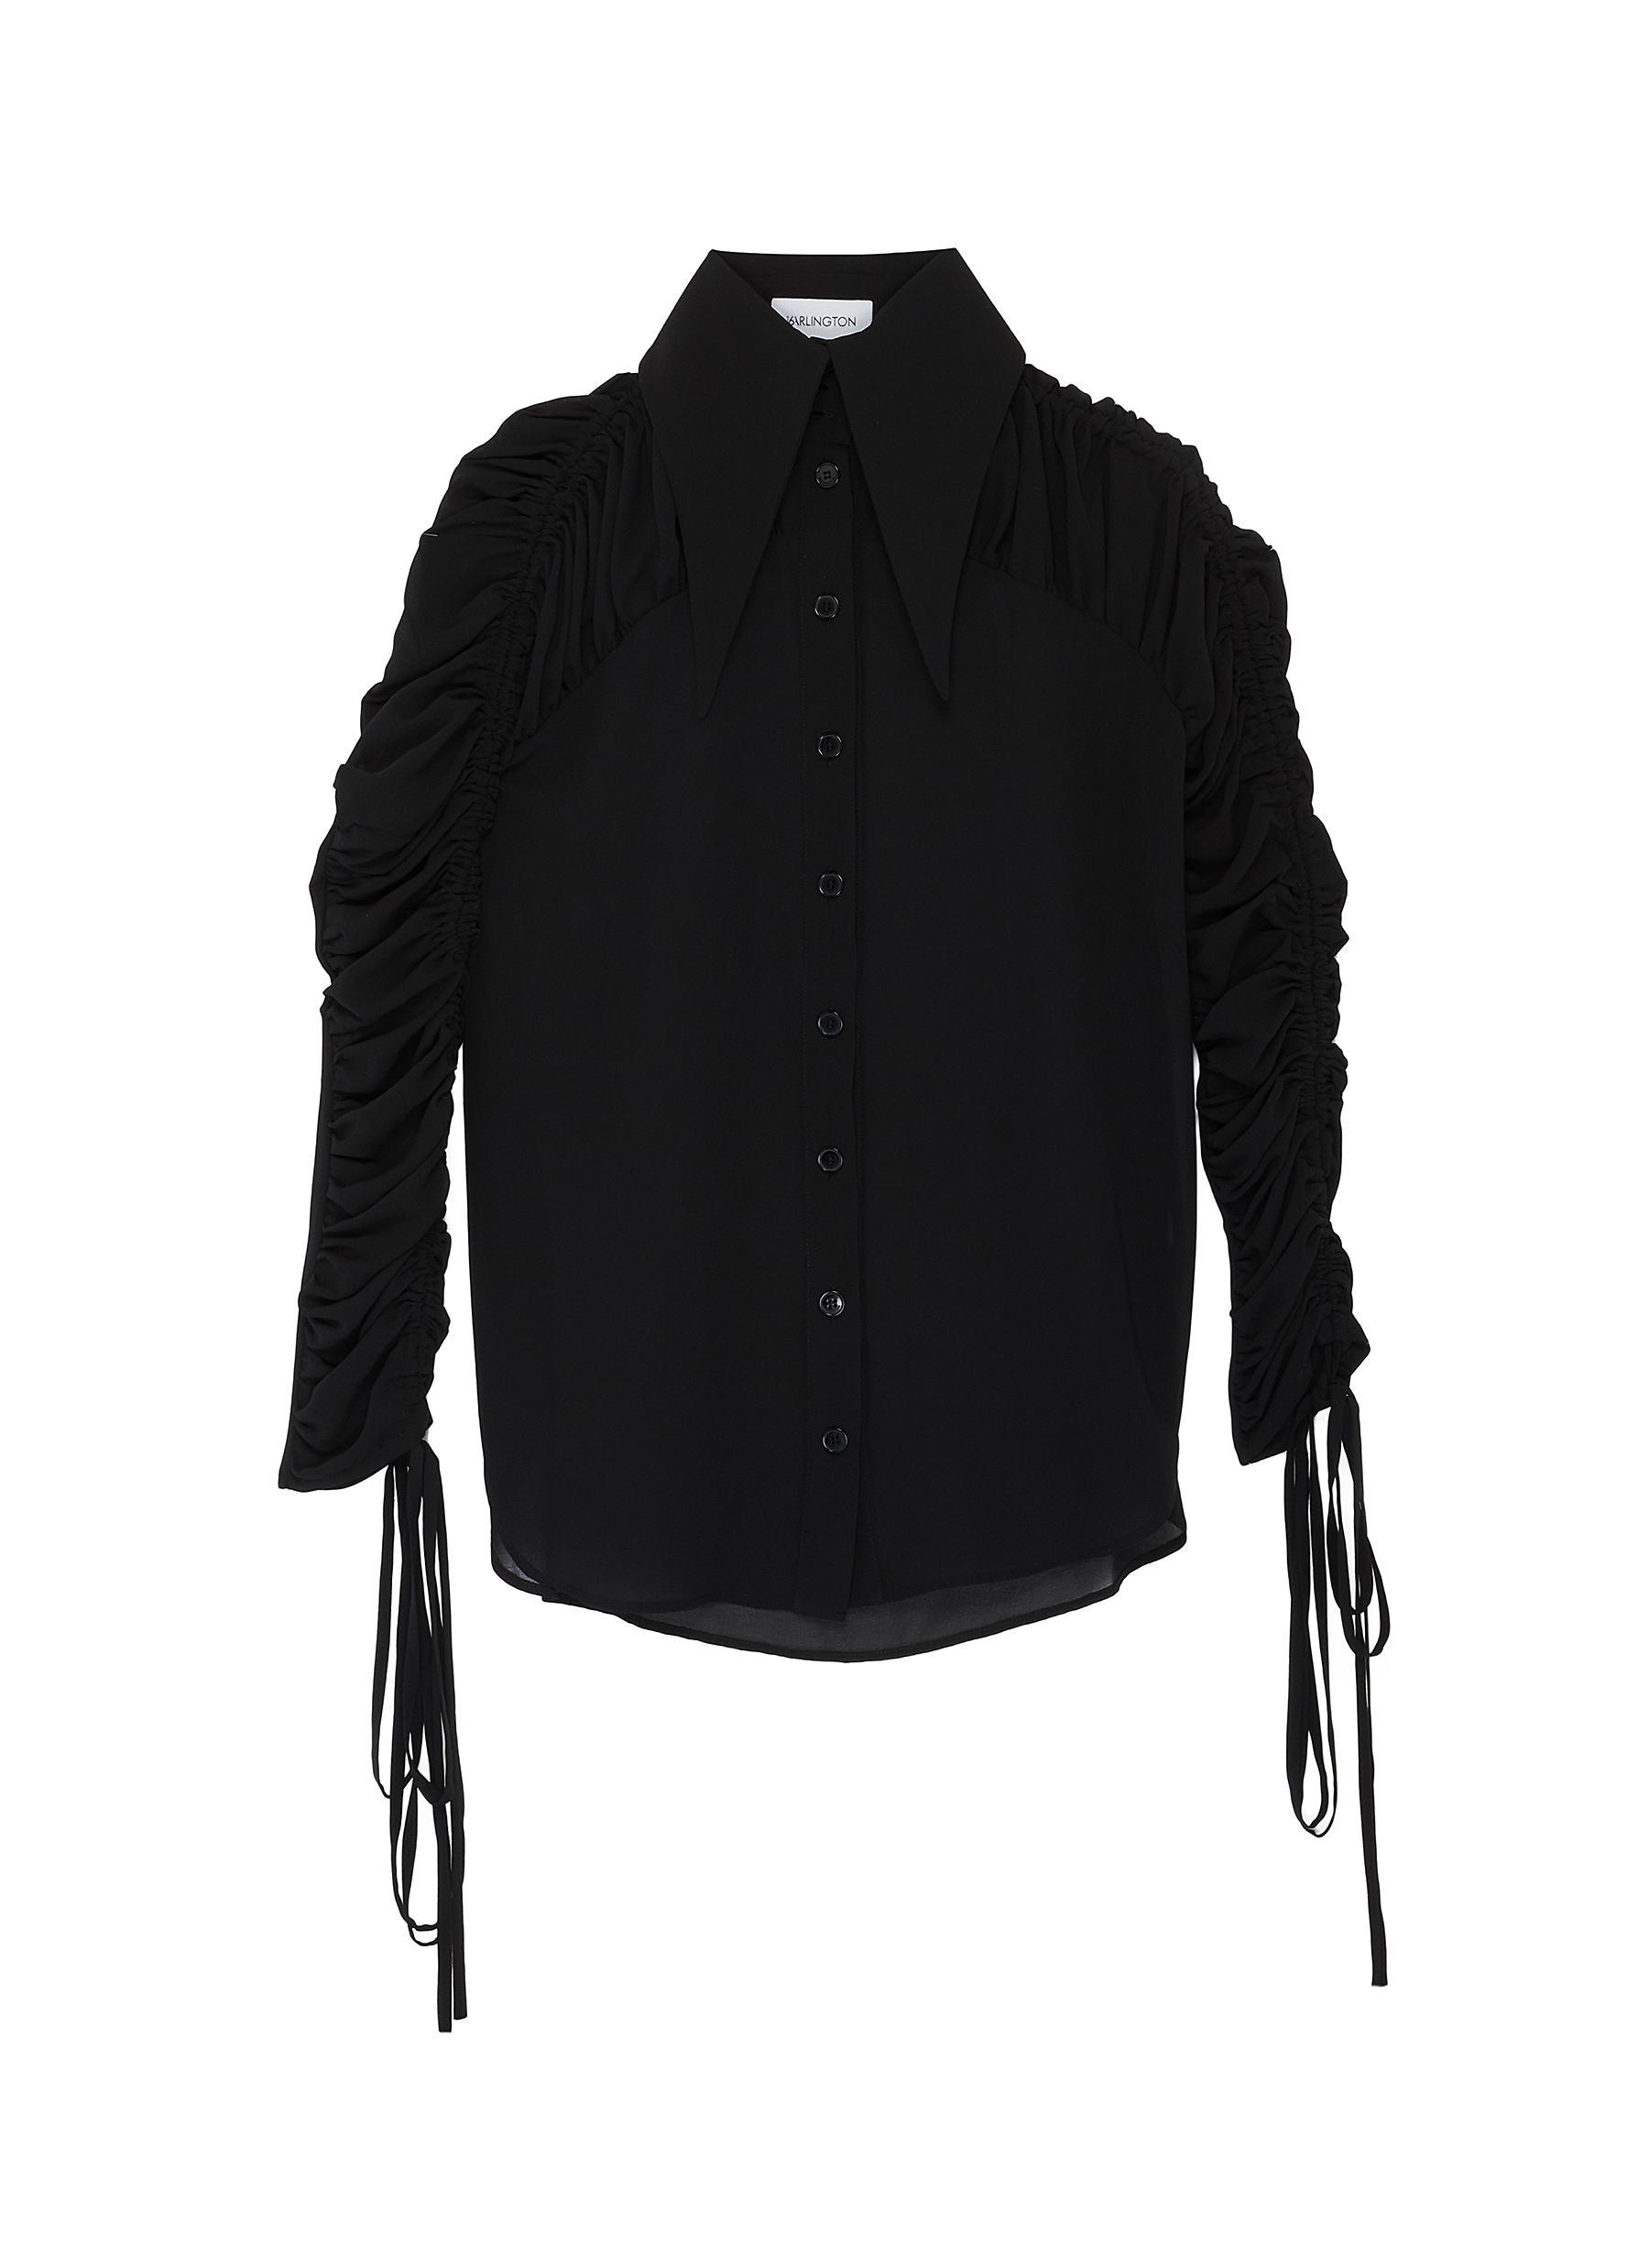 Buy 16Arlington Tops 'Marlene' gathered sheer shirt